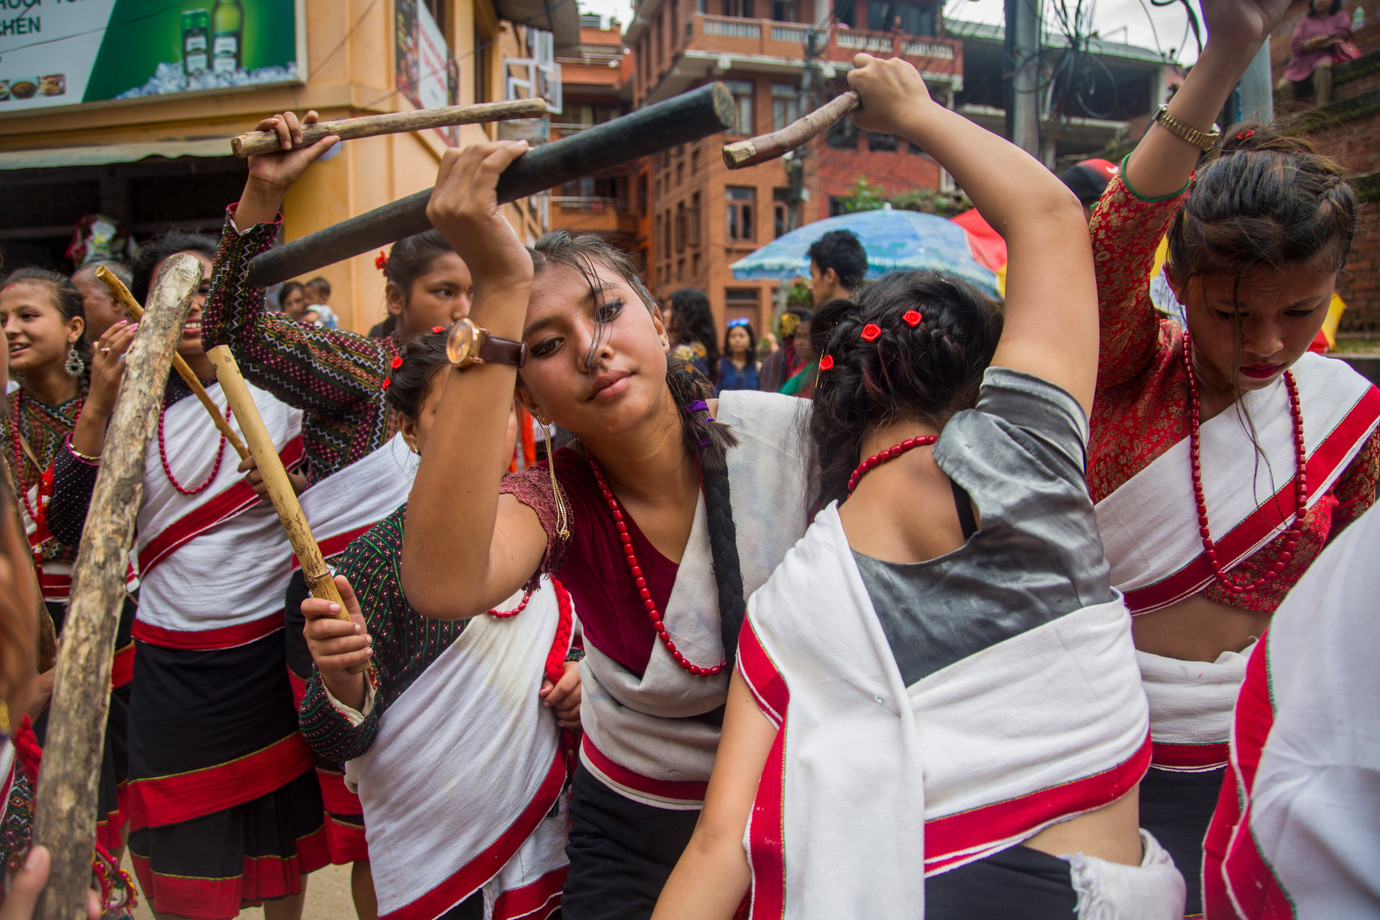 Ghintang Ghisi dance, wearing traditional newari sarees.